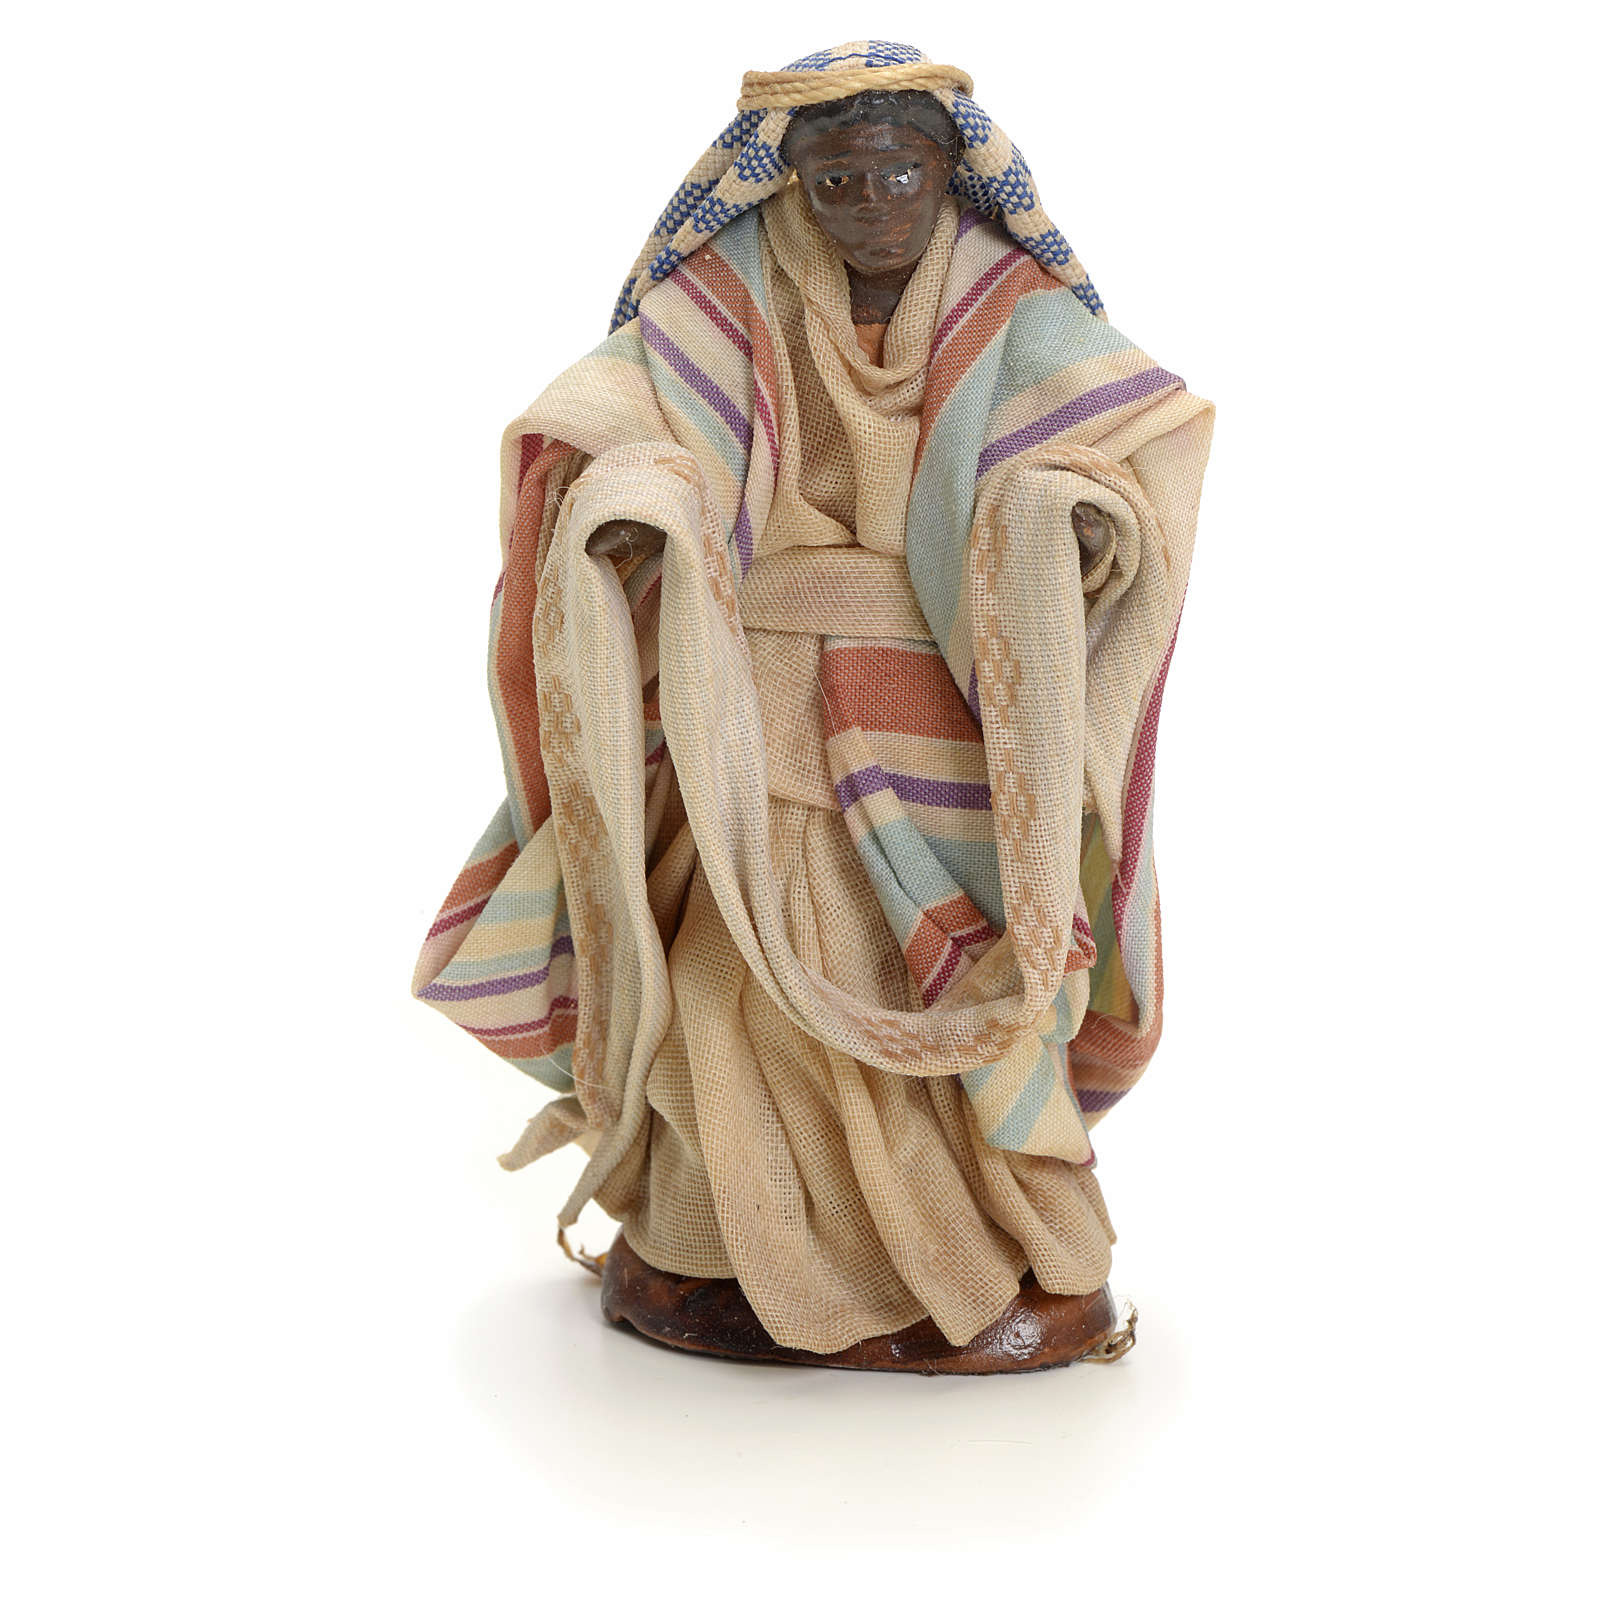 Neapolitan Nativity figurine, cloth seller, 8 cm 4